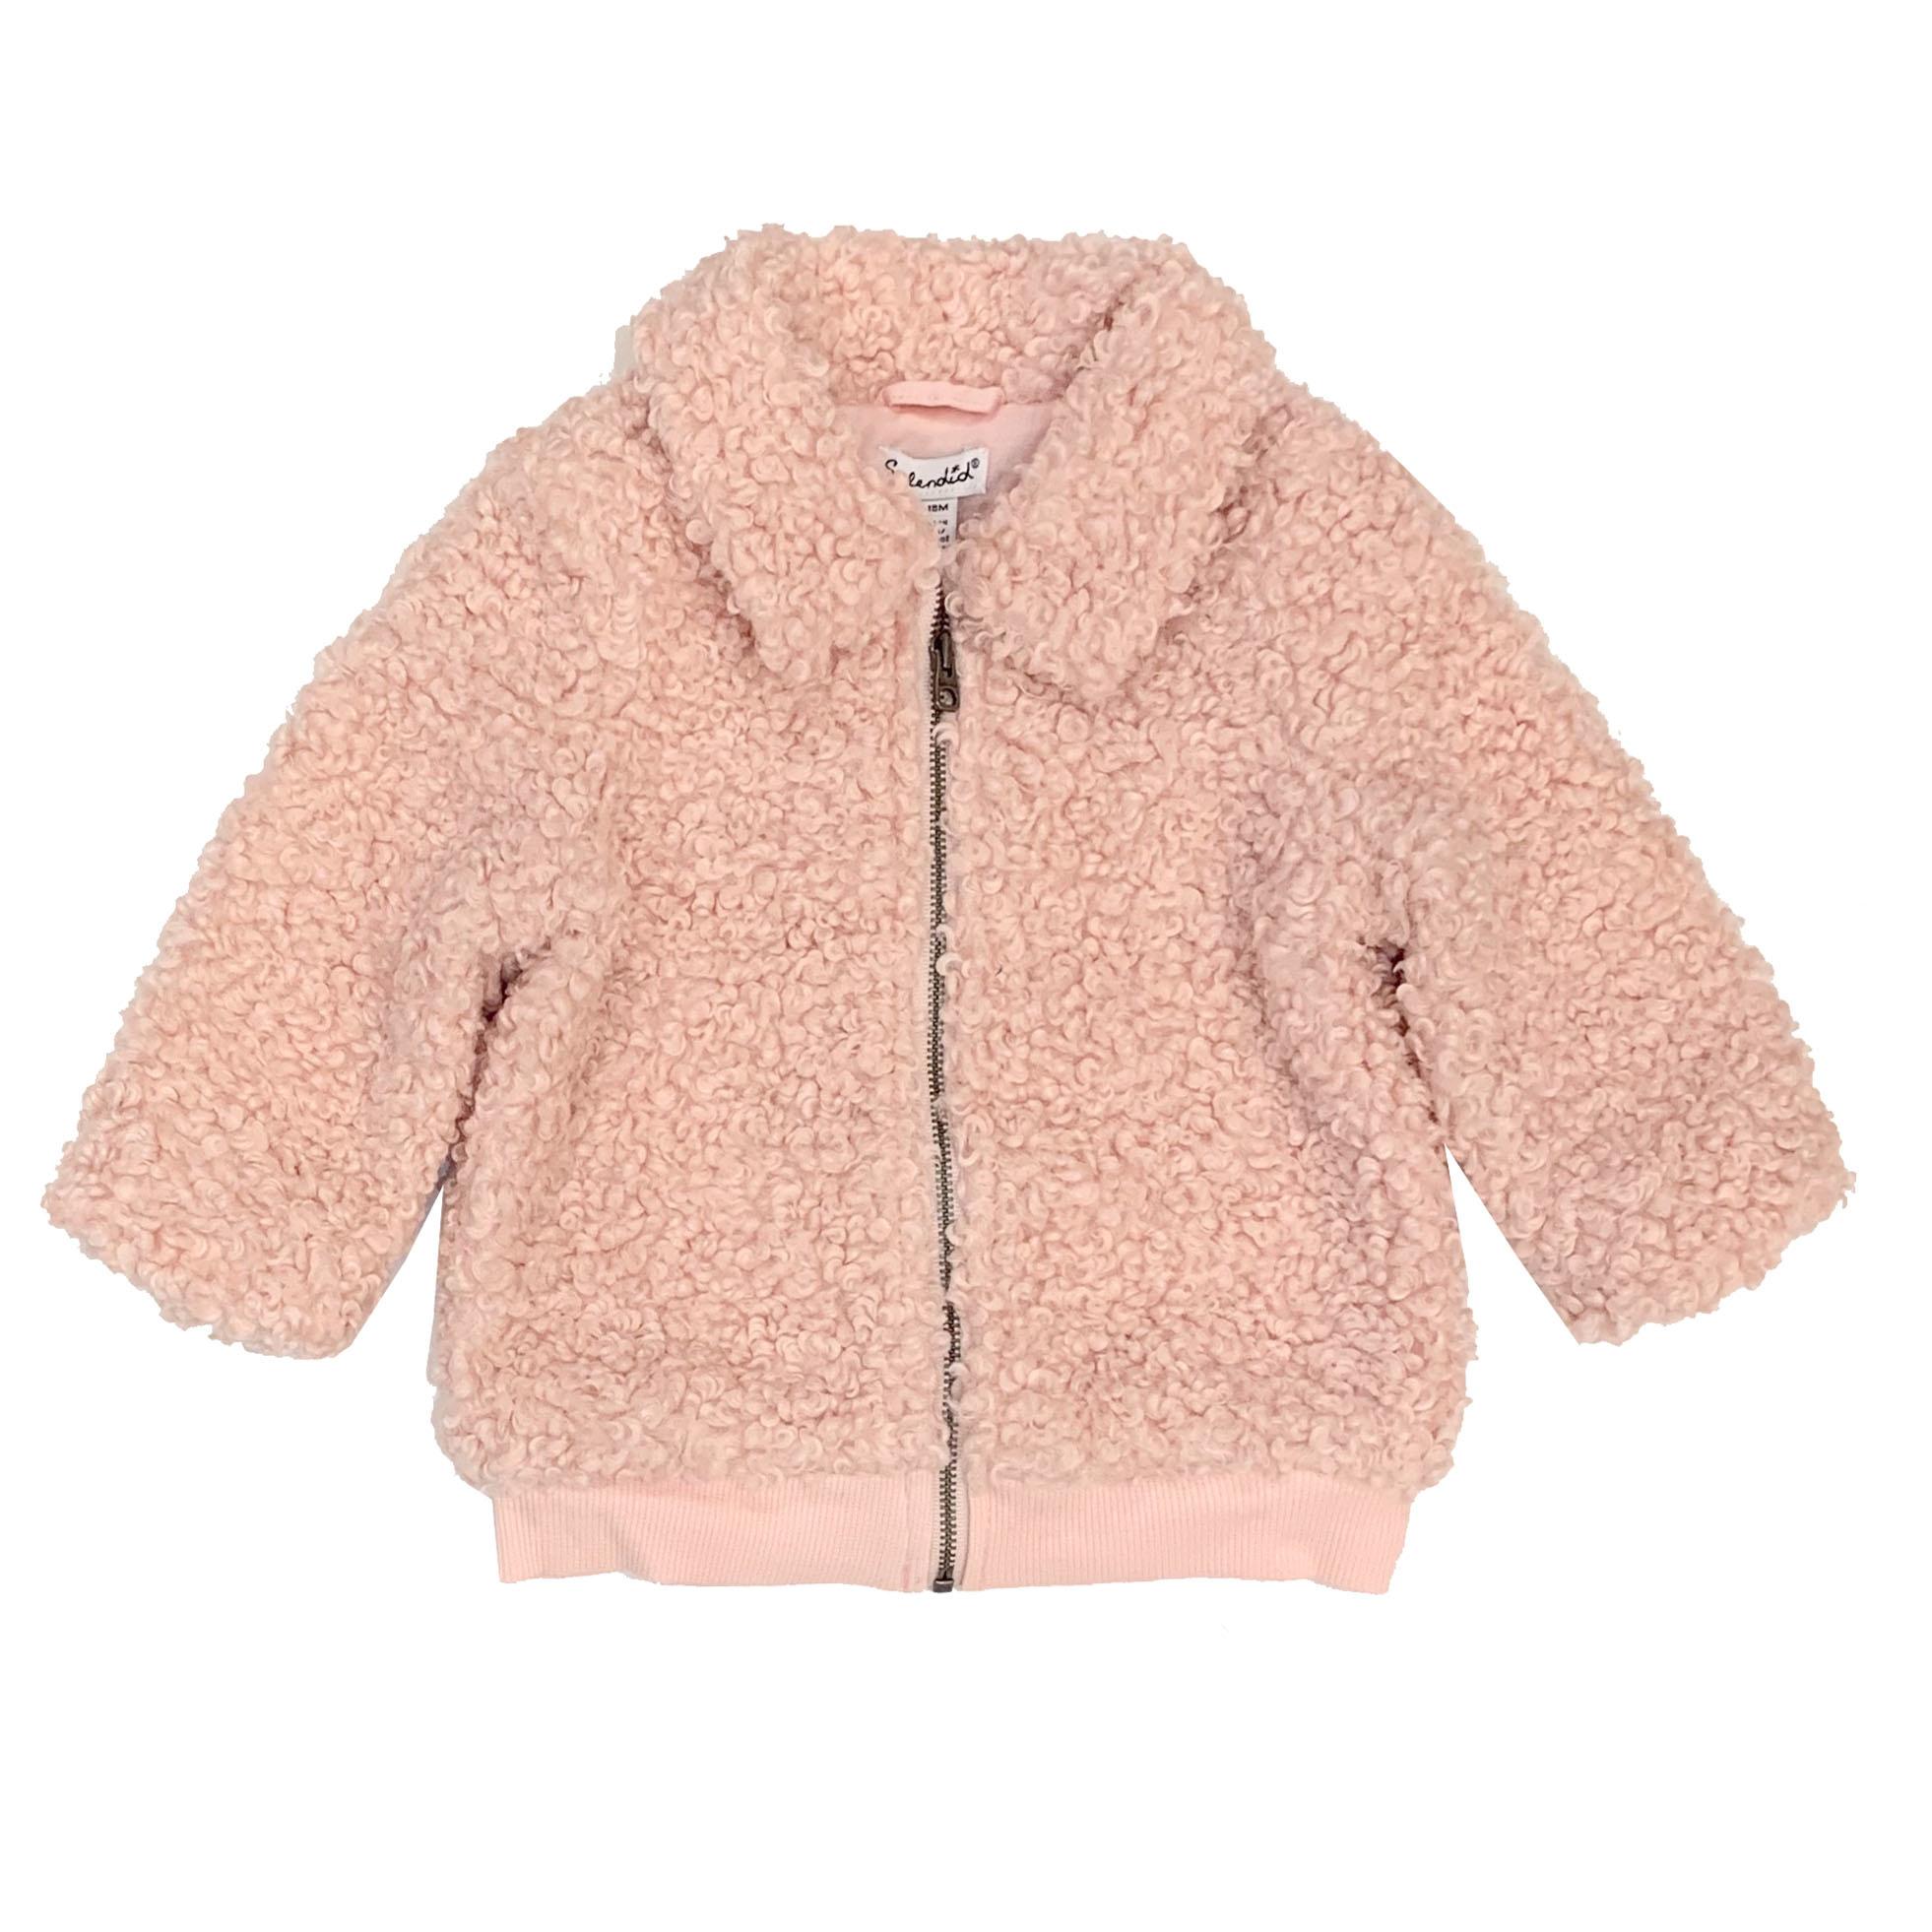 Splendid Pink Infant Faux Fur Jacket